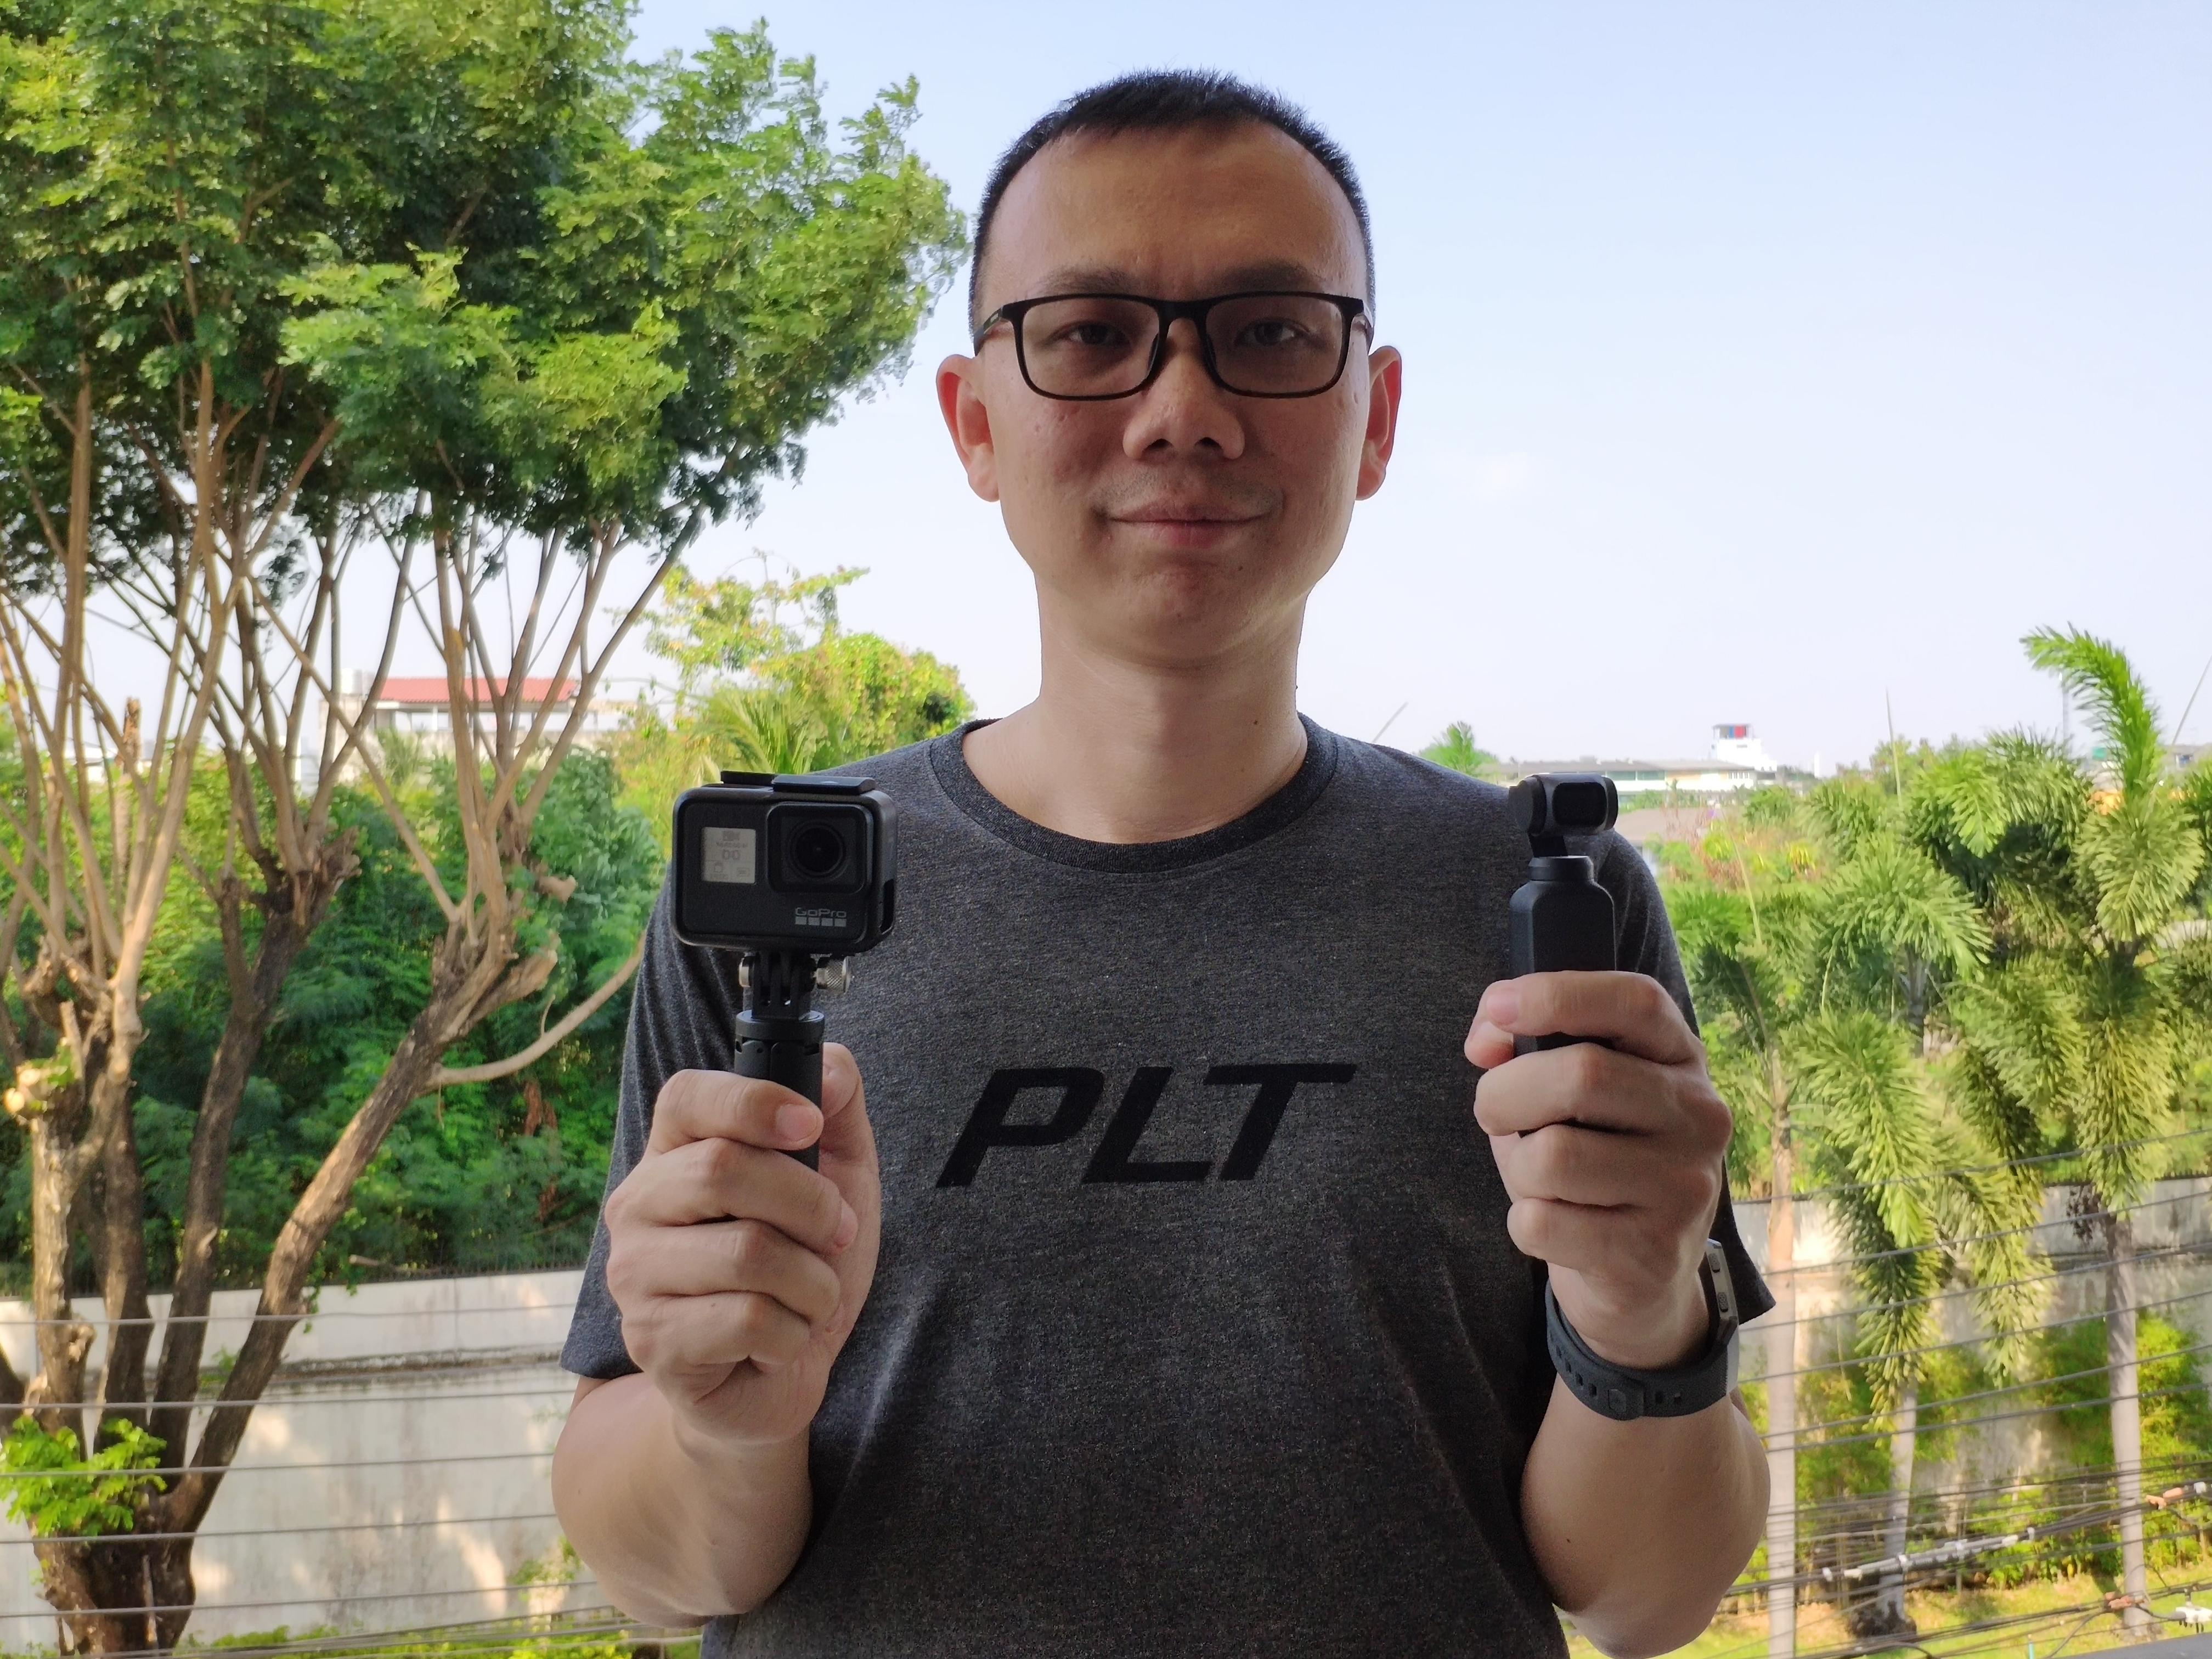 GoPro Hero 7 Black vs DJI Osmo Pocket ตัวไหน ใช่สำหรับคุณ 1